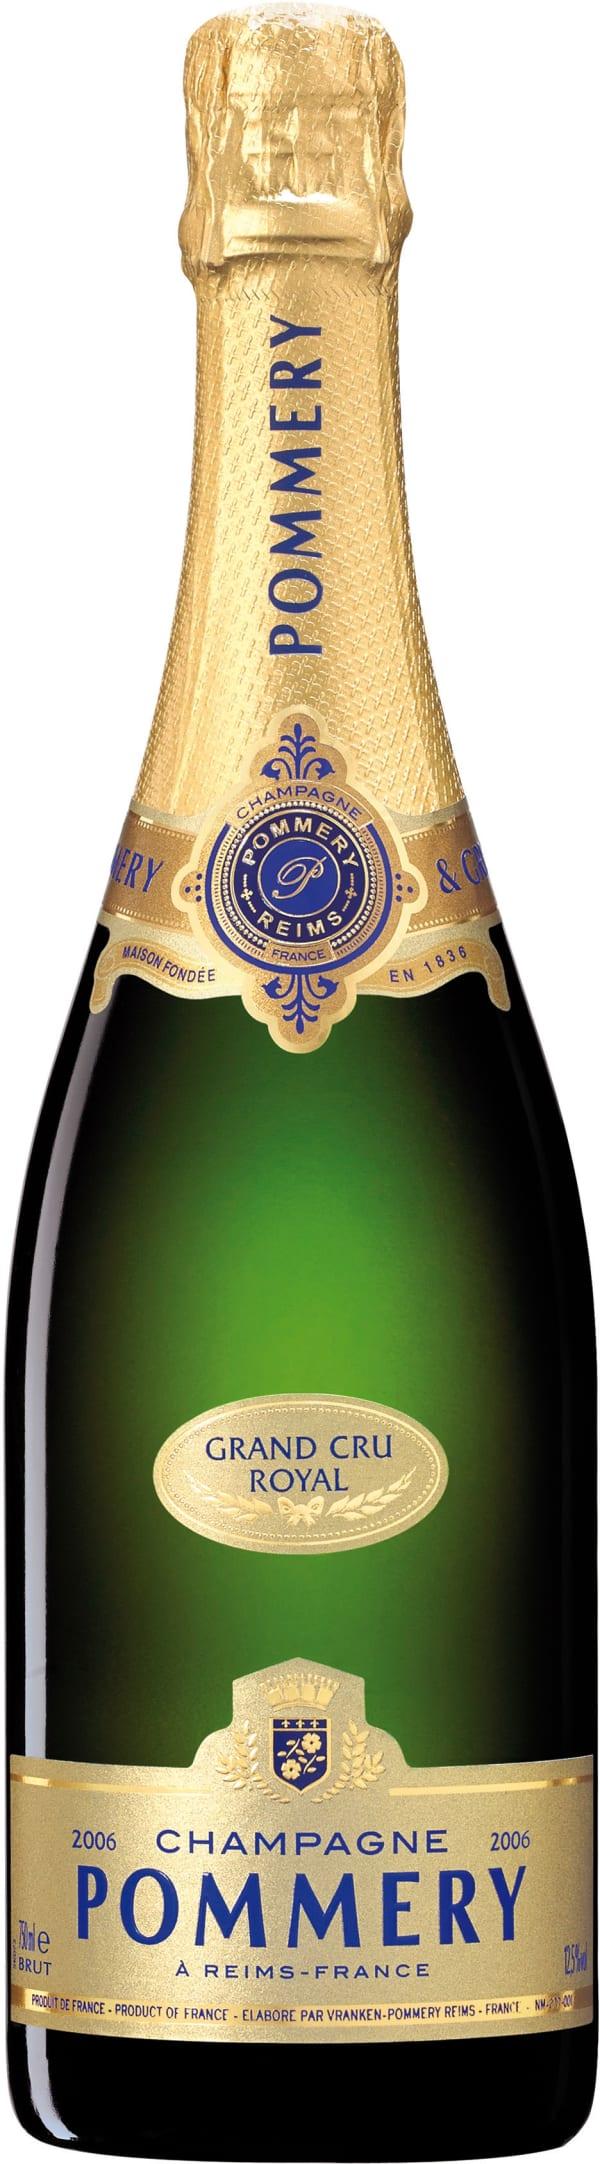 Pommery Grand Cru Royal Millesime Champagne Brut 2006